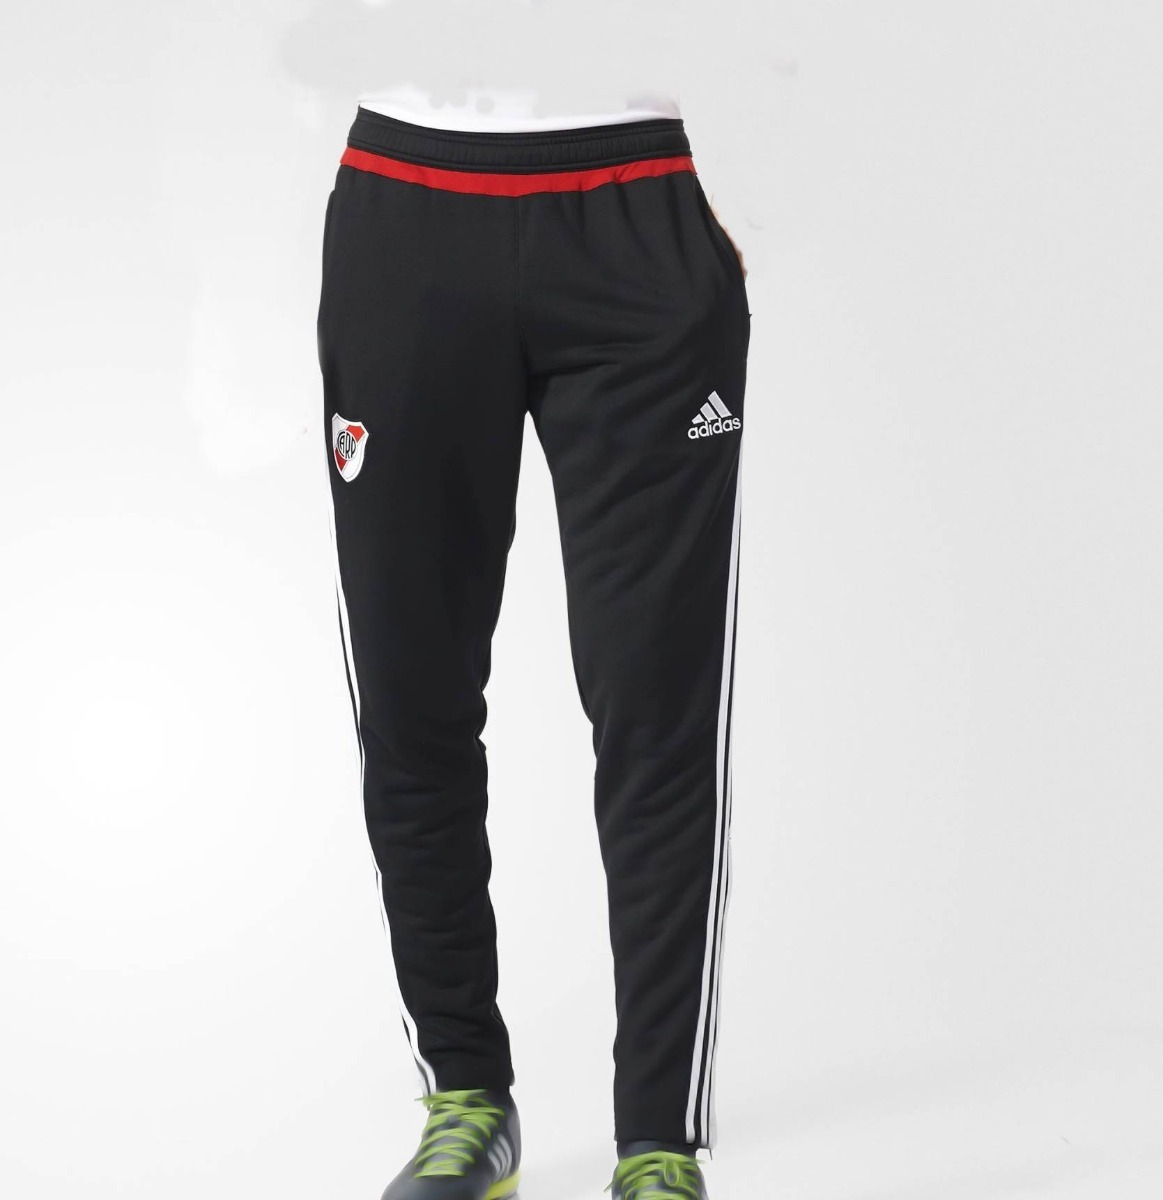 River Cyber Plate Oferta Adidas Pantalon PZukXi